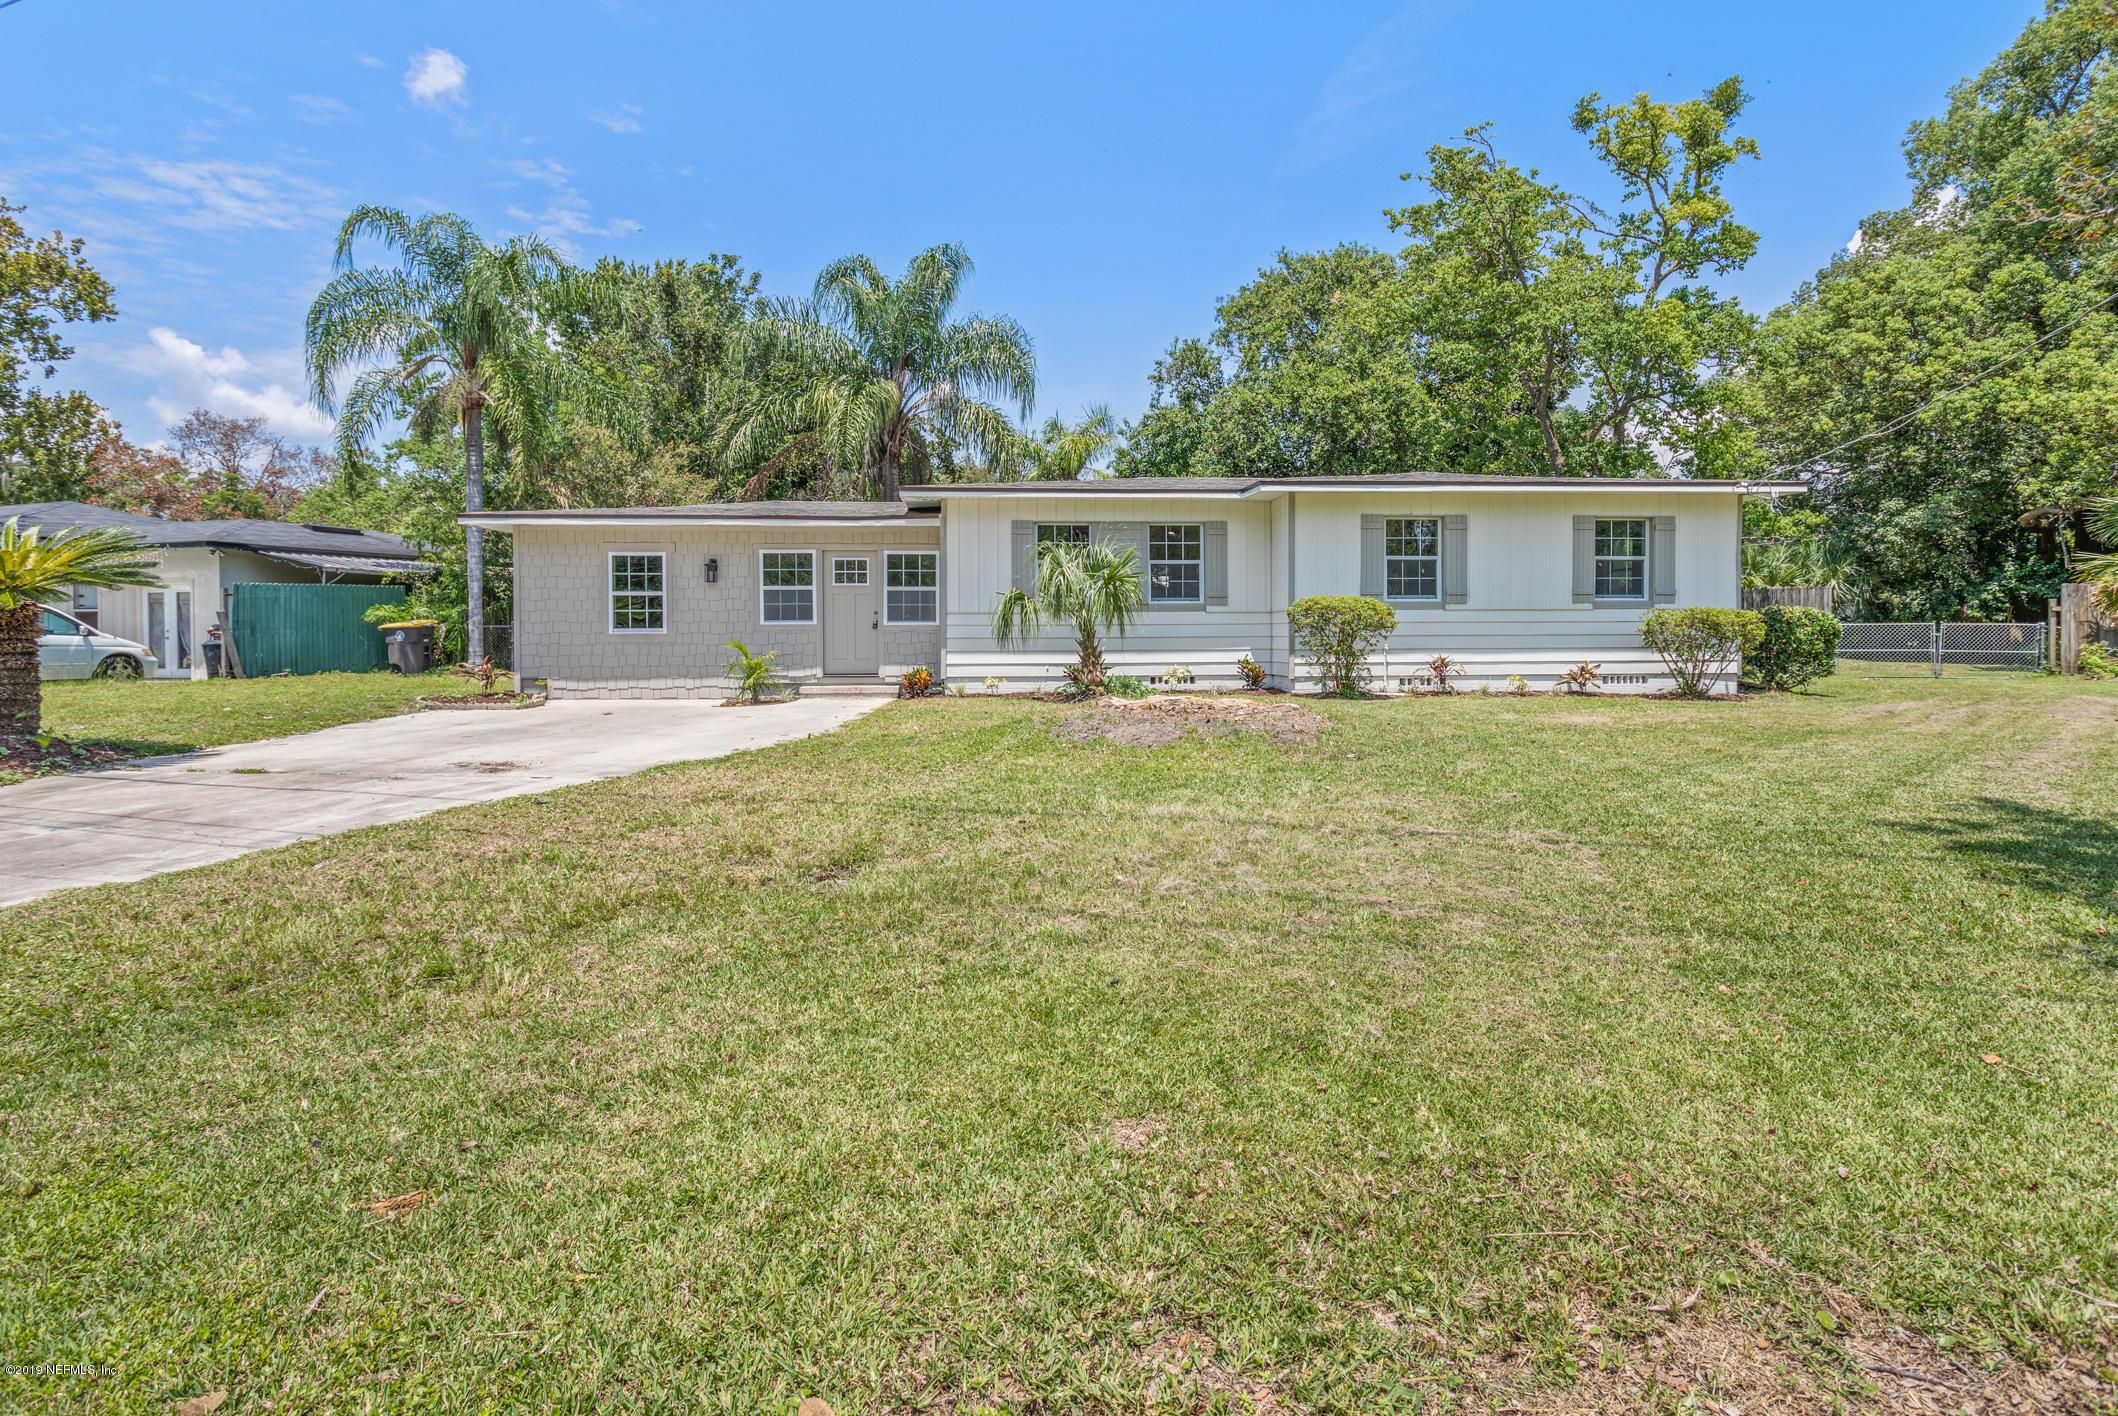 4705 BLOUNT, JACKSONVILLE, FLORIDA 32210, 4 Bedrooms Bedrooms, ,2 BathroomsBathrooms,Residential - single family,For sale,BLOUNT,1011371